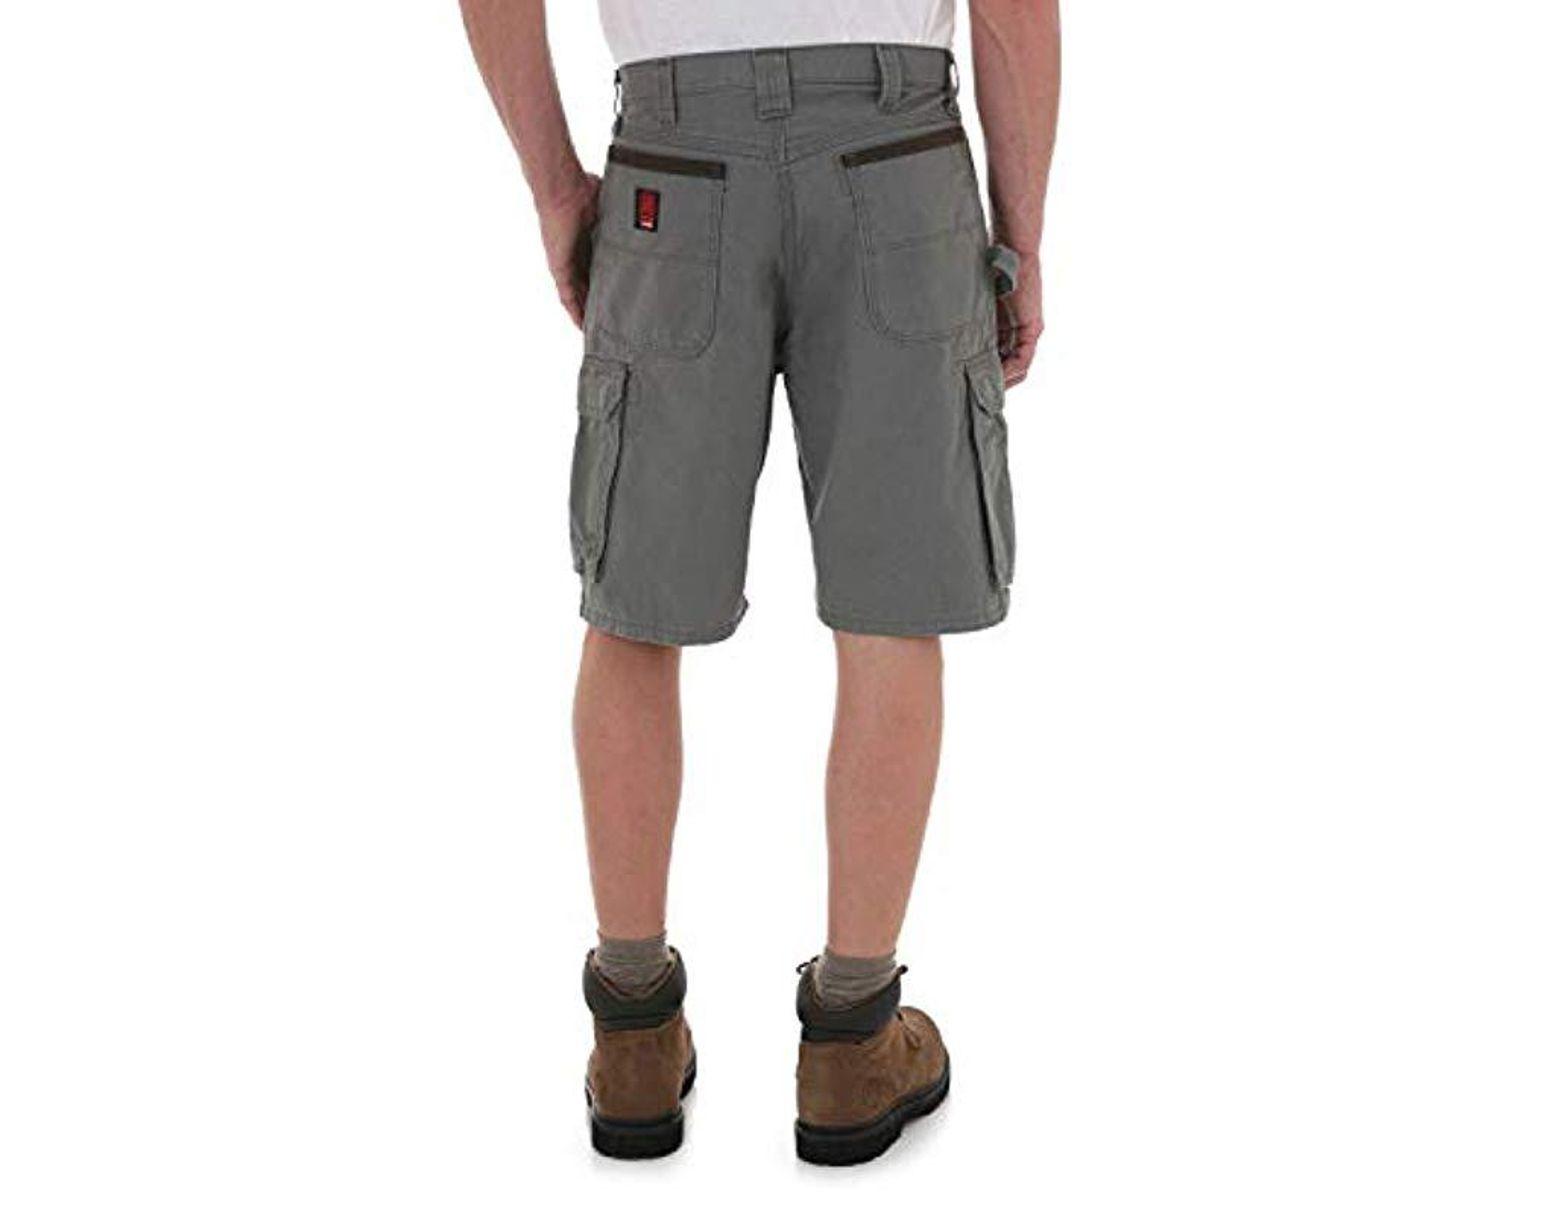 9ca83d49 Wrangler RIGGS Workwear Ranger Cargo Short in Gray for Men - Save 14% - Lyst